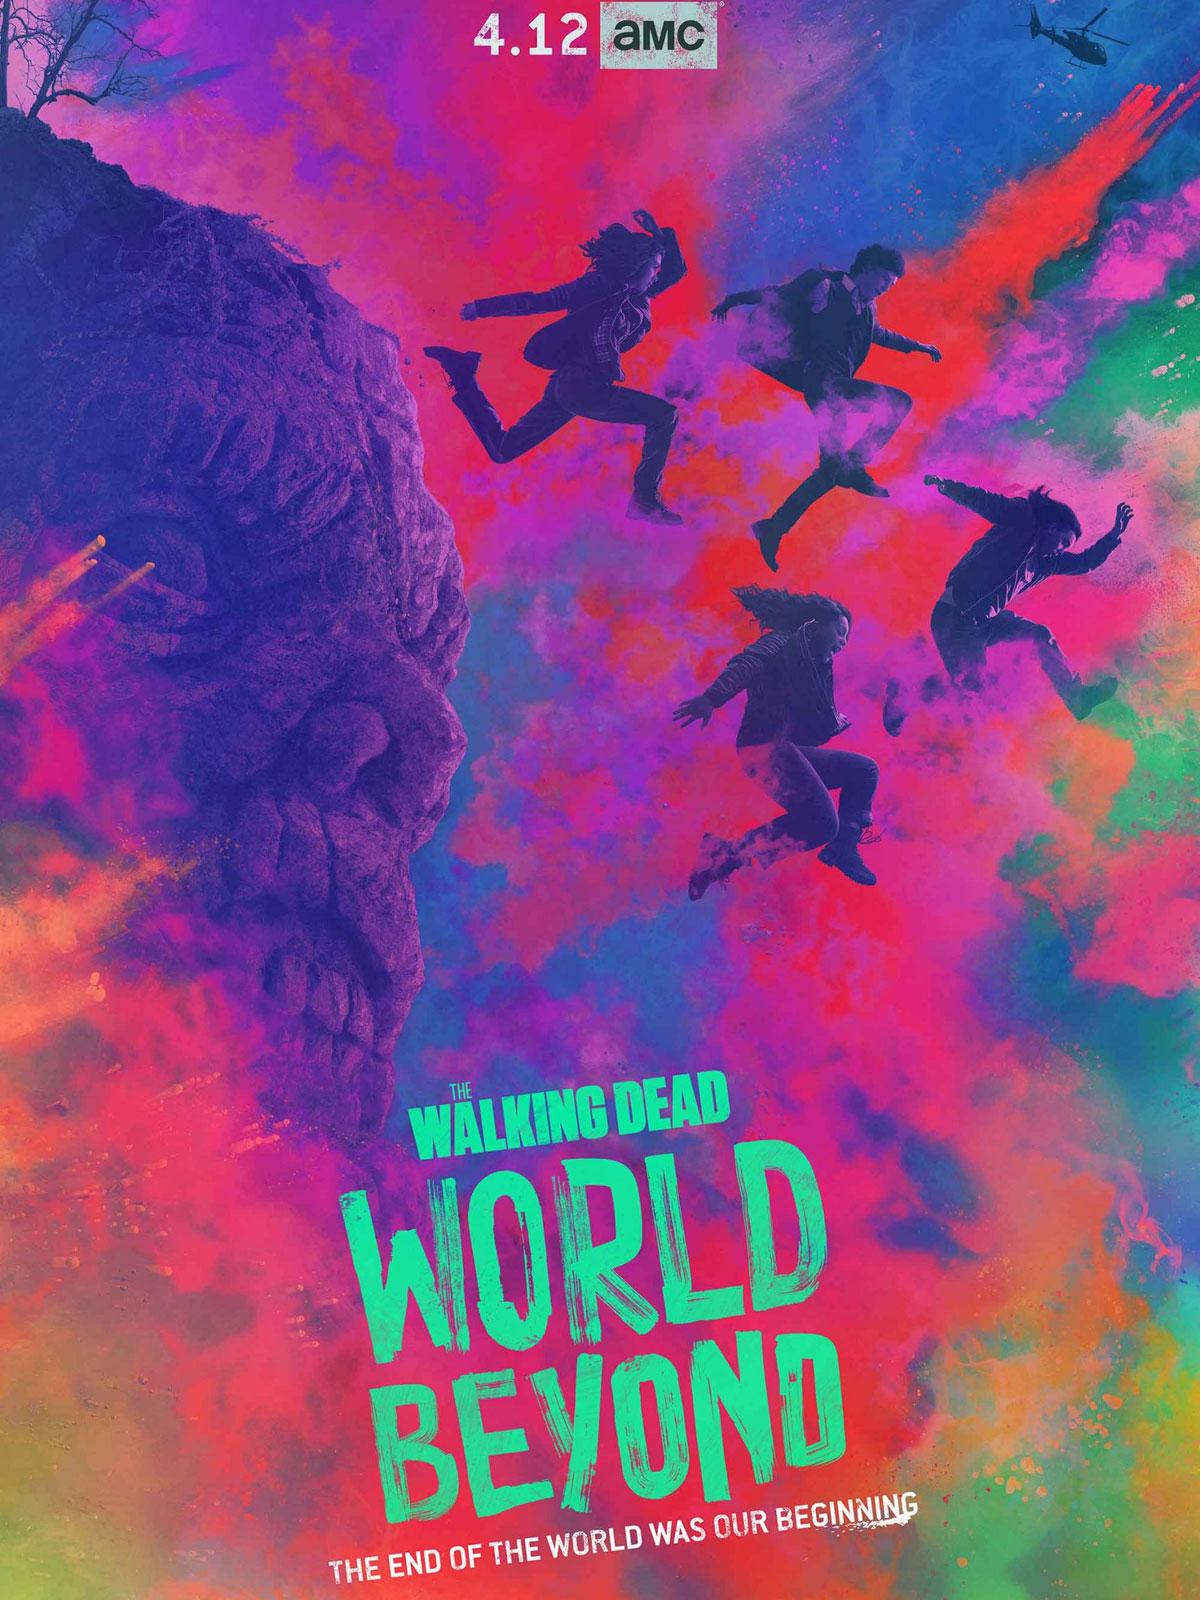 40 - The Walking Dead: World Beyond